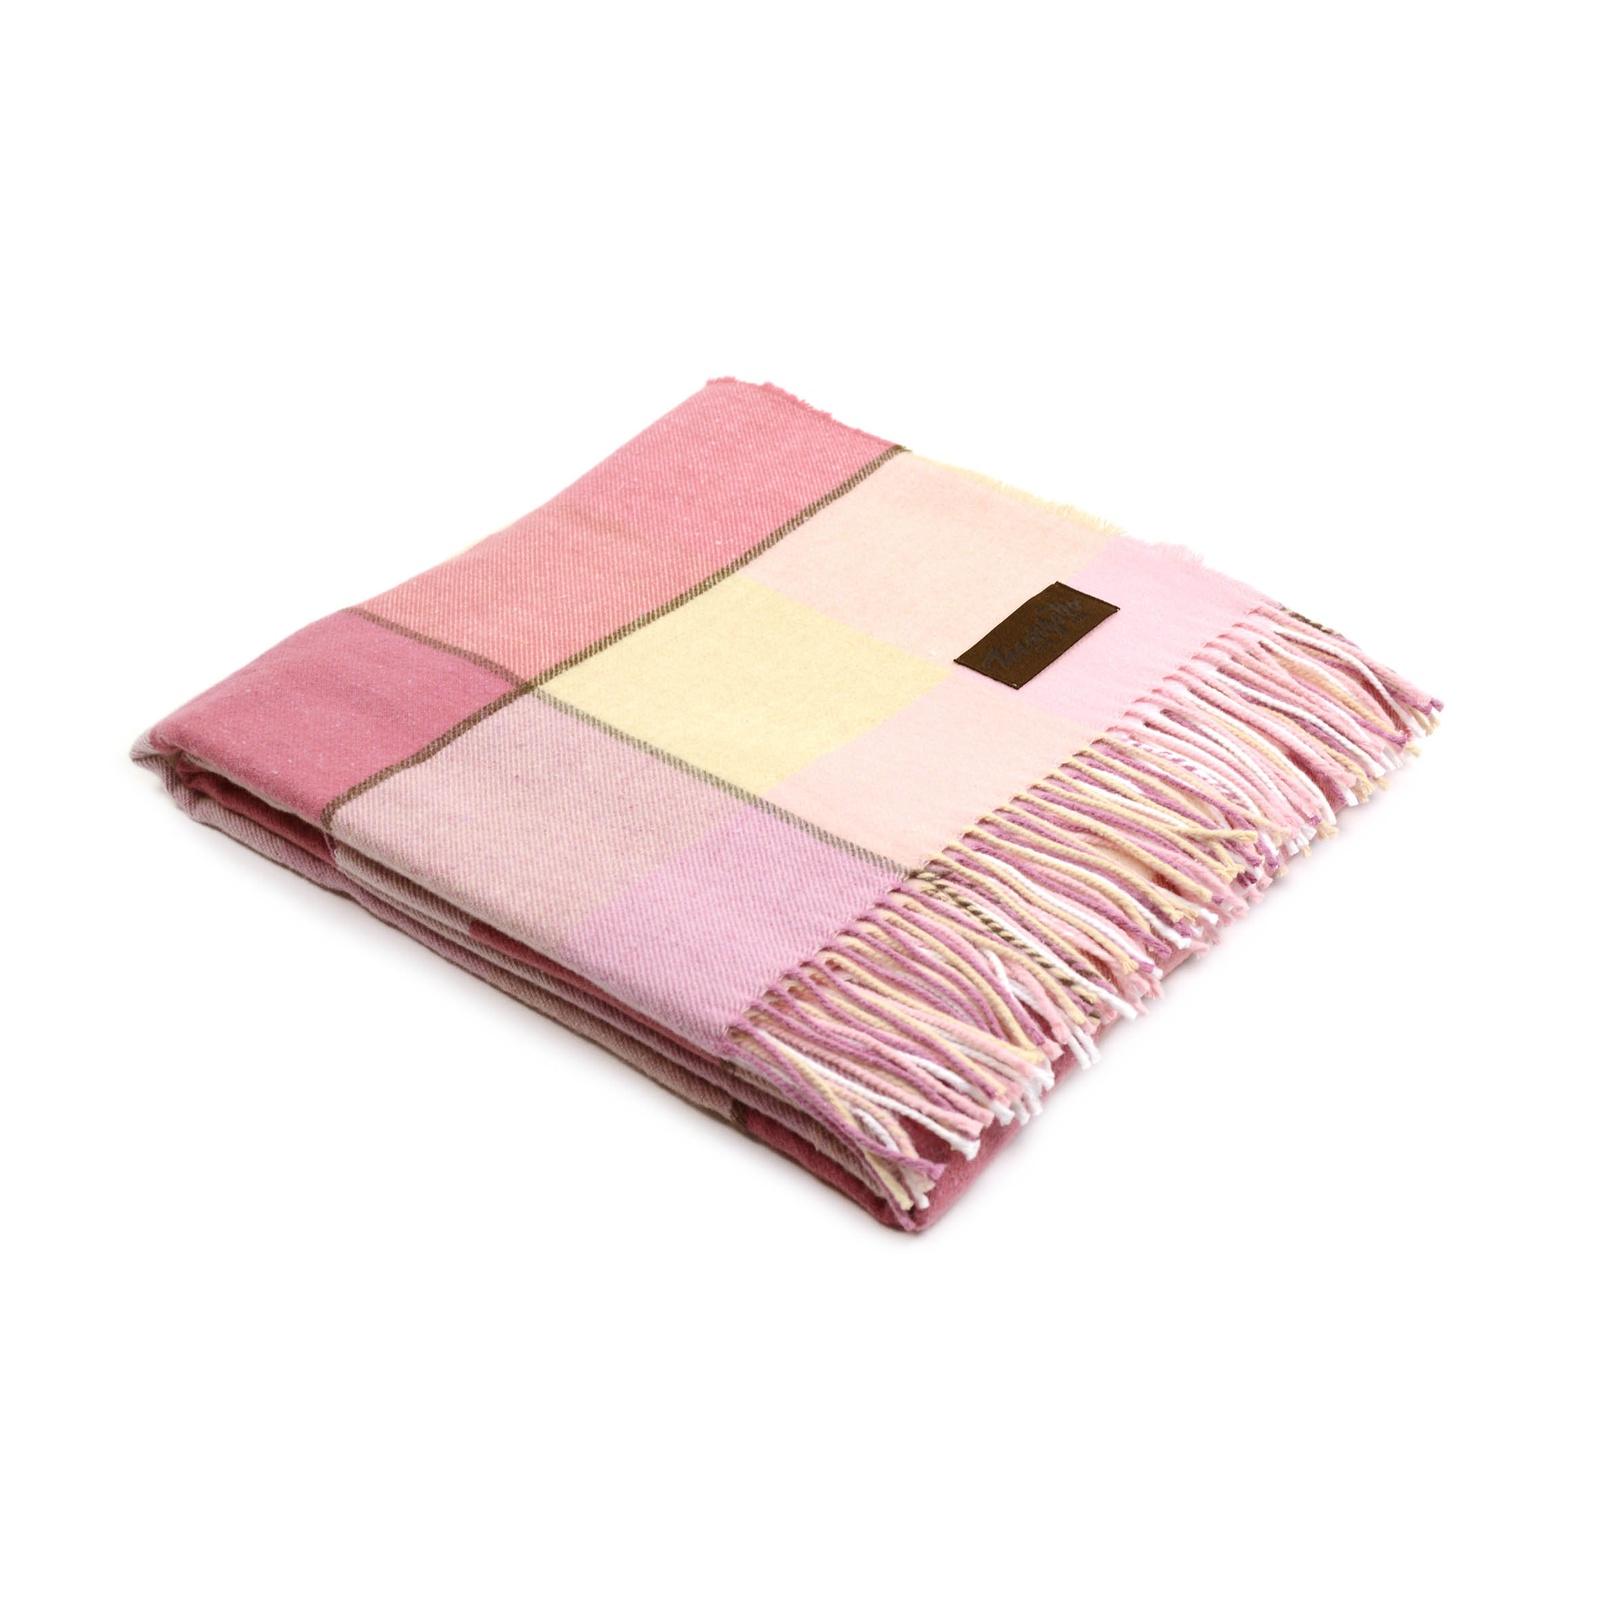 Плед MARZOTTO ALBERT, ALBERT 1, розовый, светло-розовый, бежевый